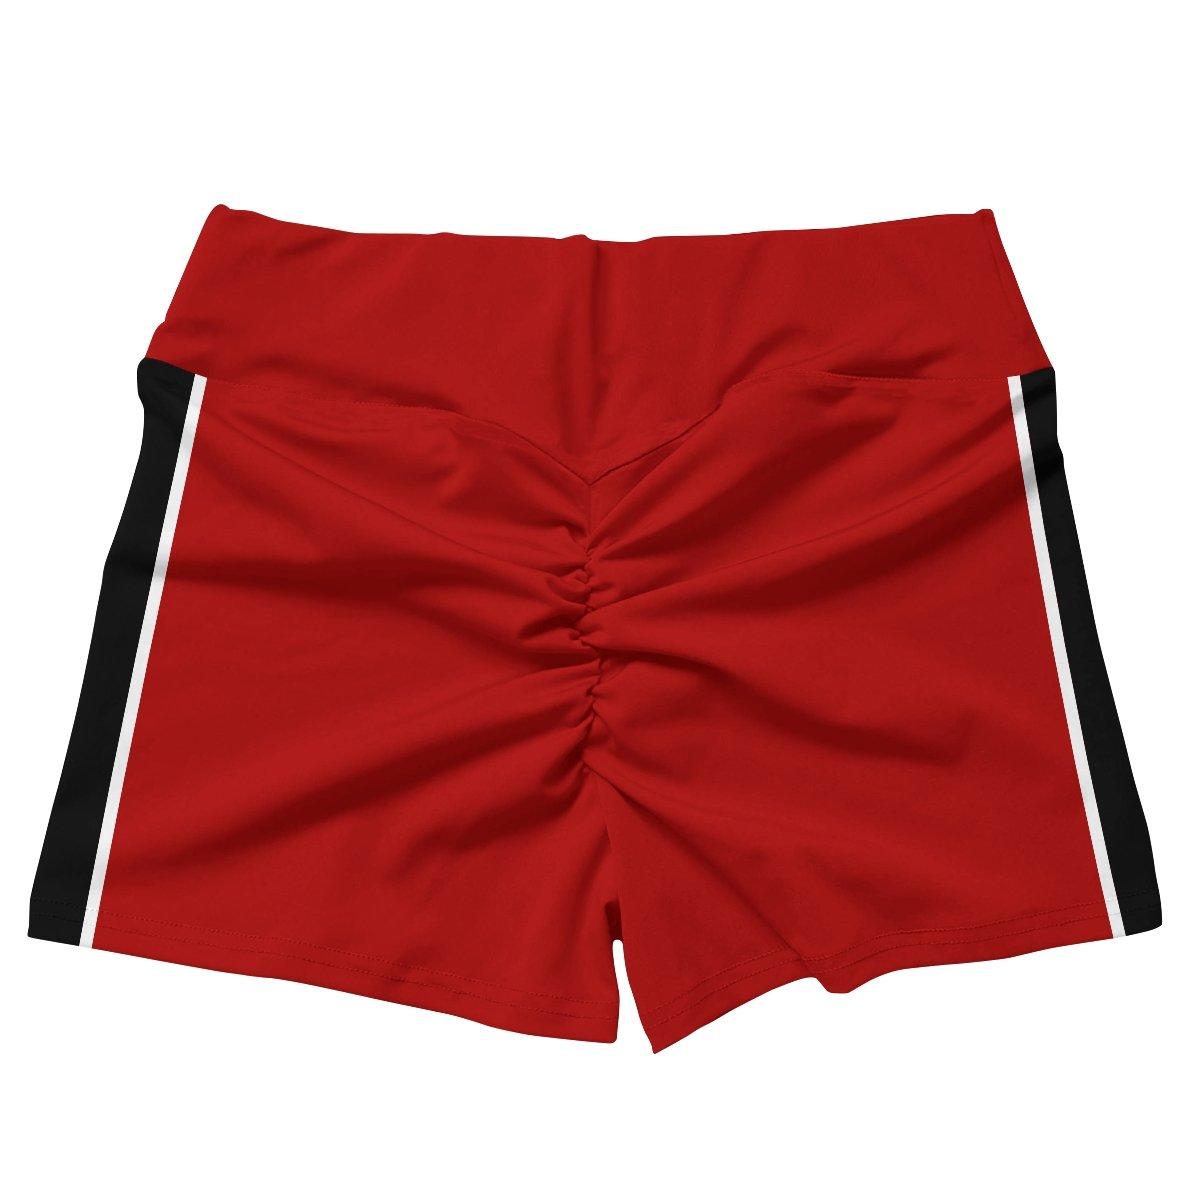 haikyuu national team active wear set 962977 - Anime Swimsuits